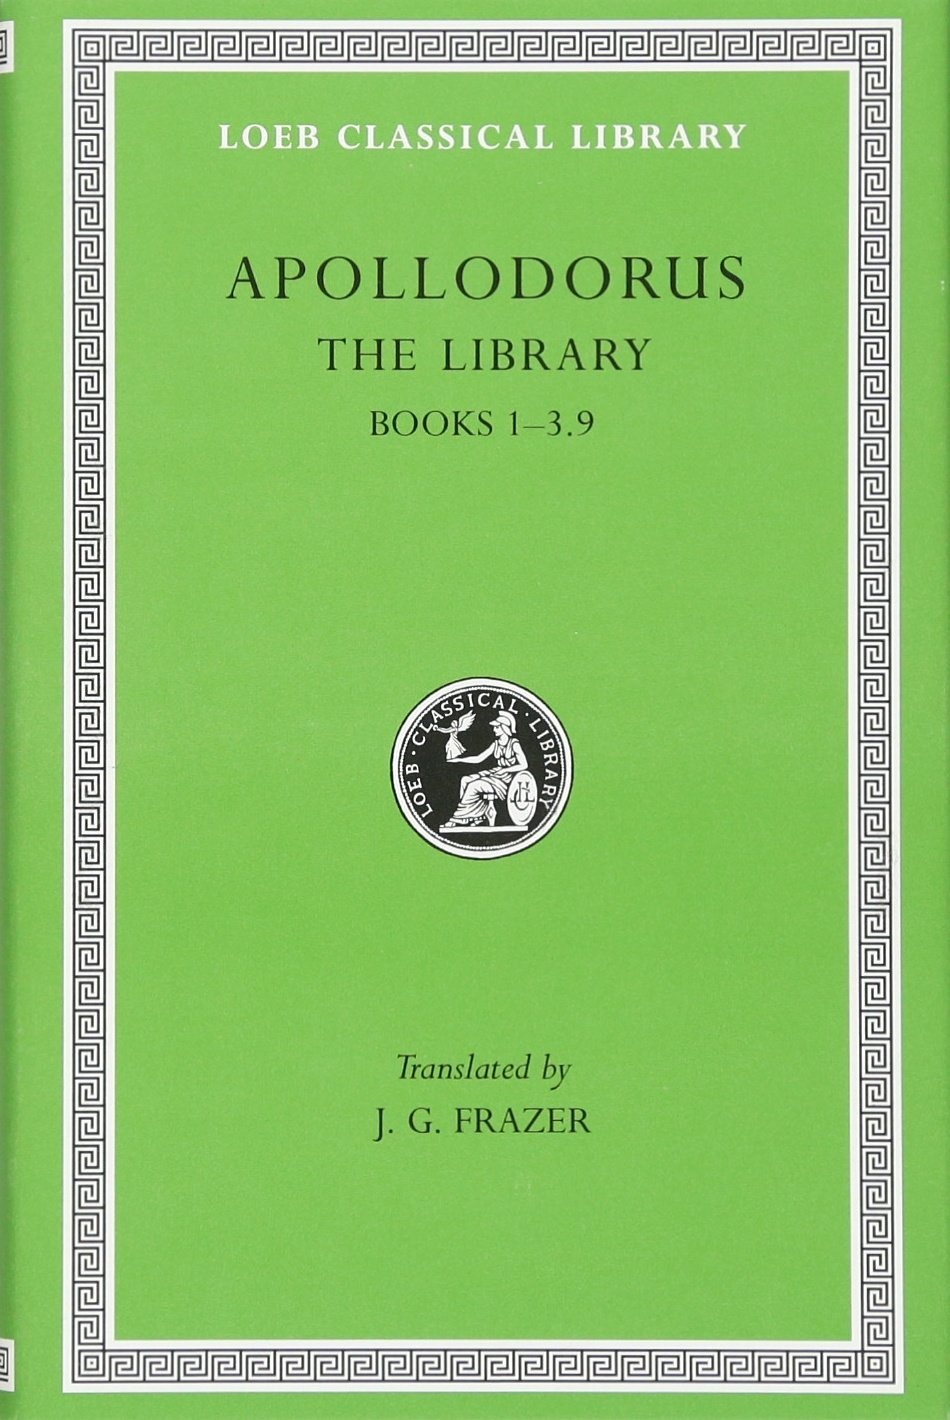 Apollodorus:  The Library, Volume I: Books 1-3.9